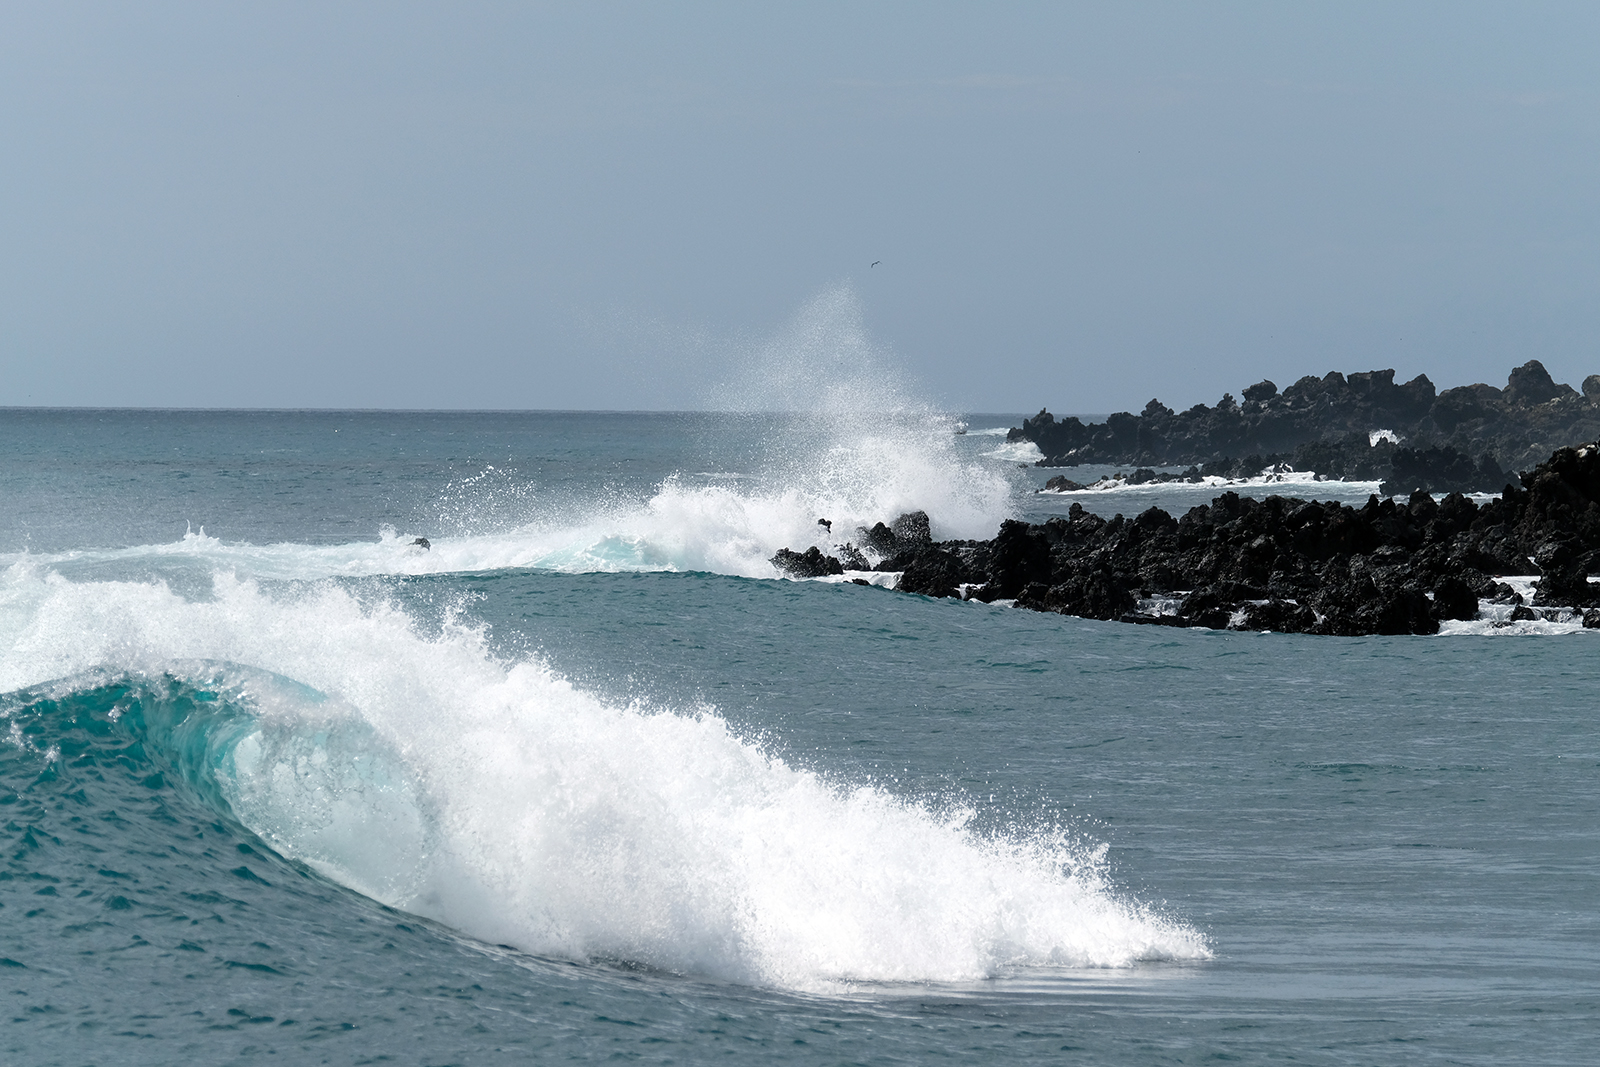 09_isla_Floreana_snorkeling_playa_Loberia_02.JPG